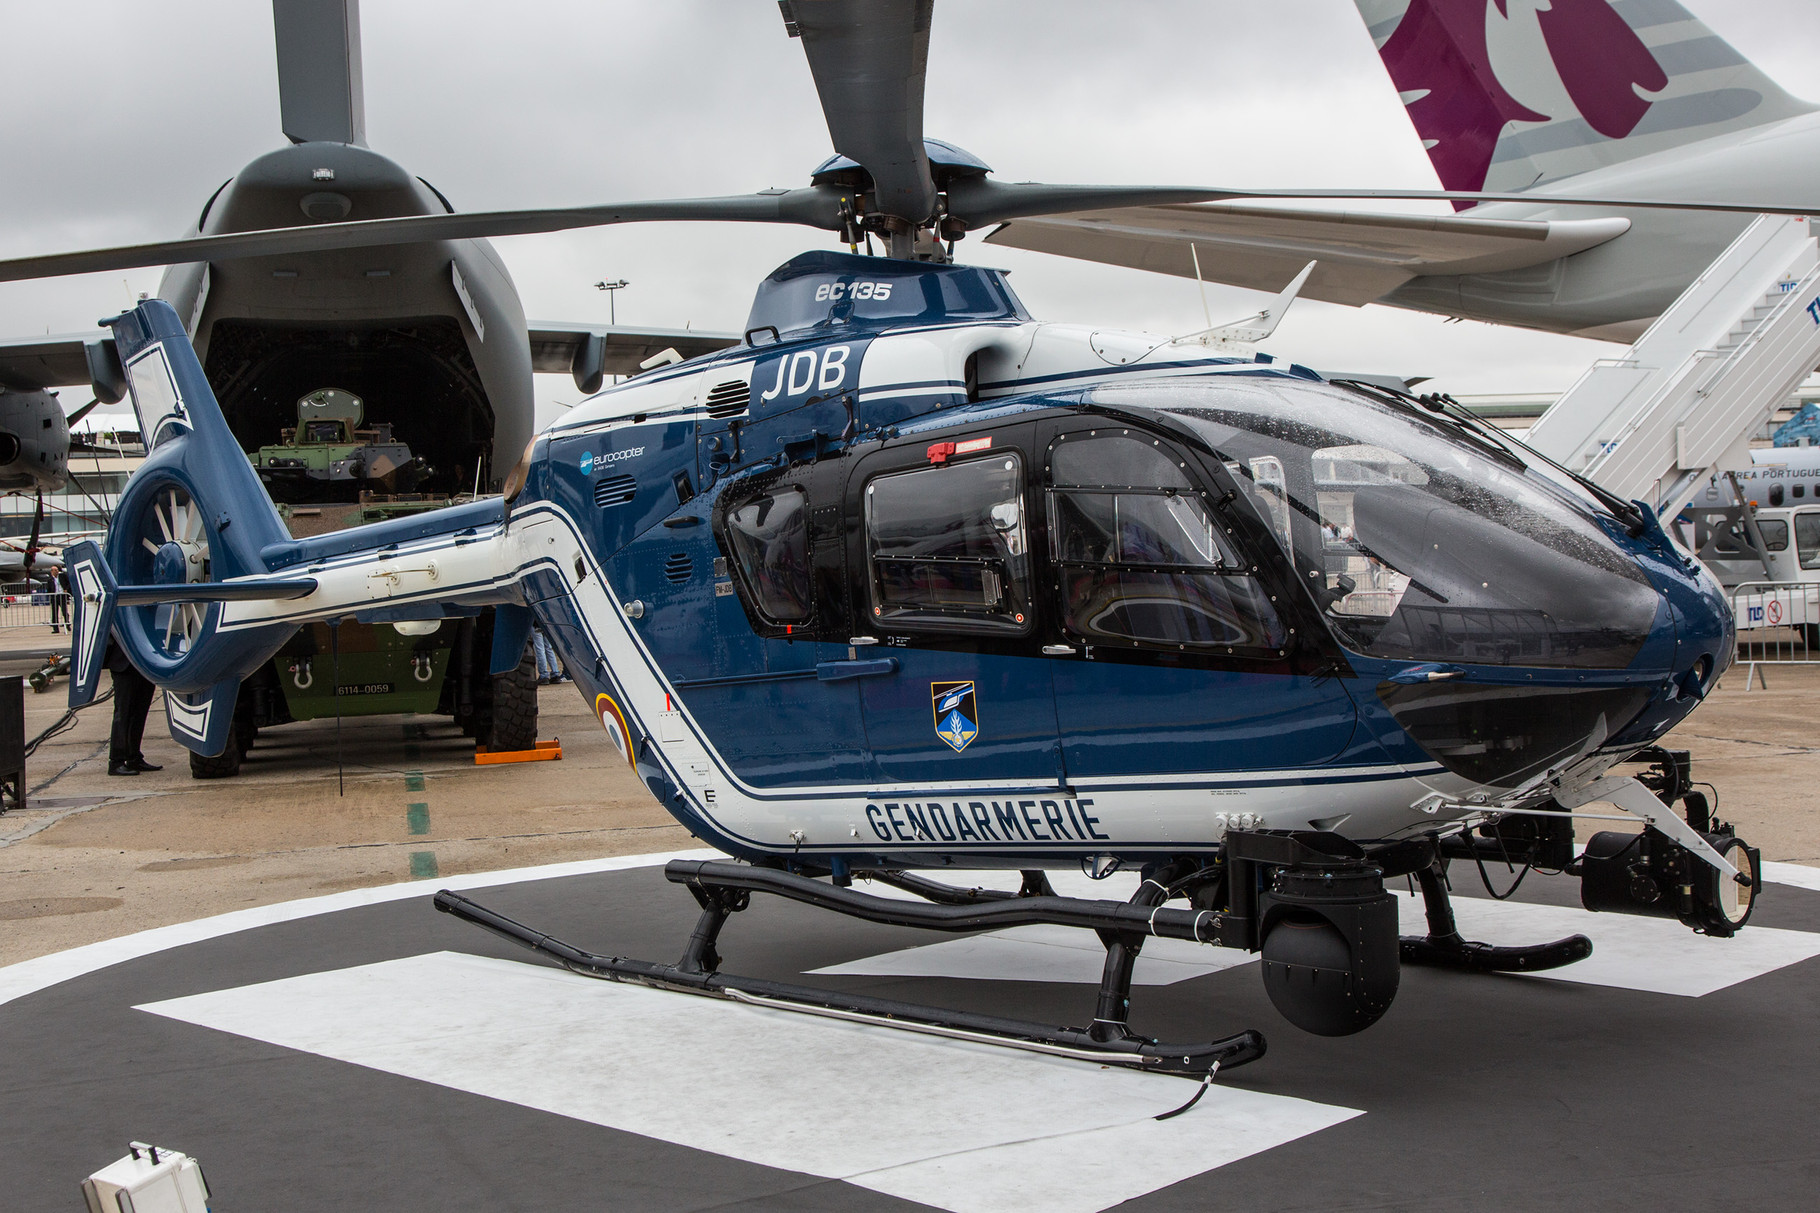 EC-135 der Gendarmerie.